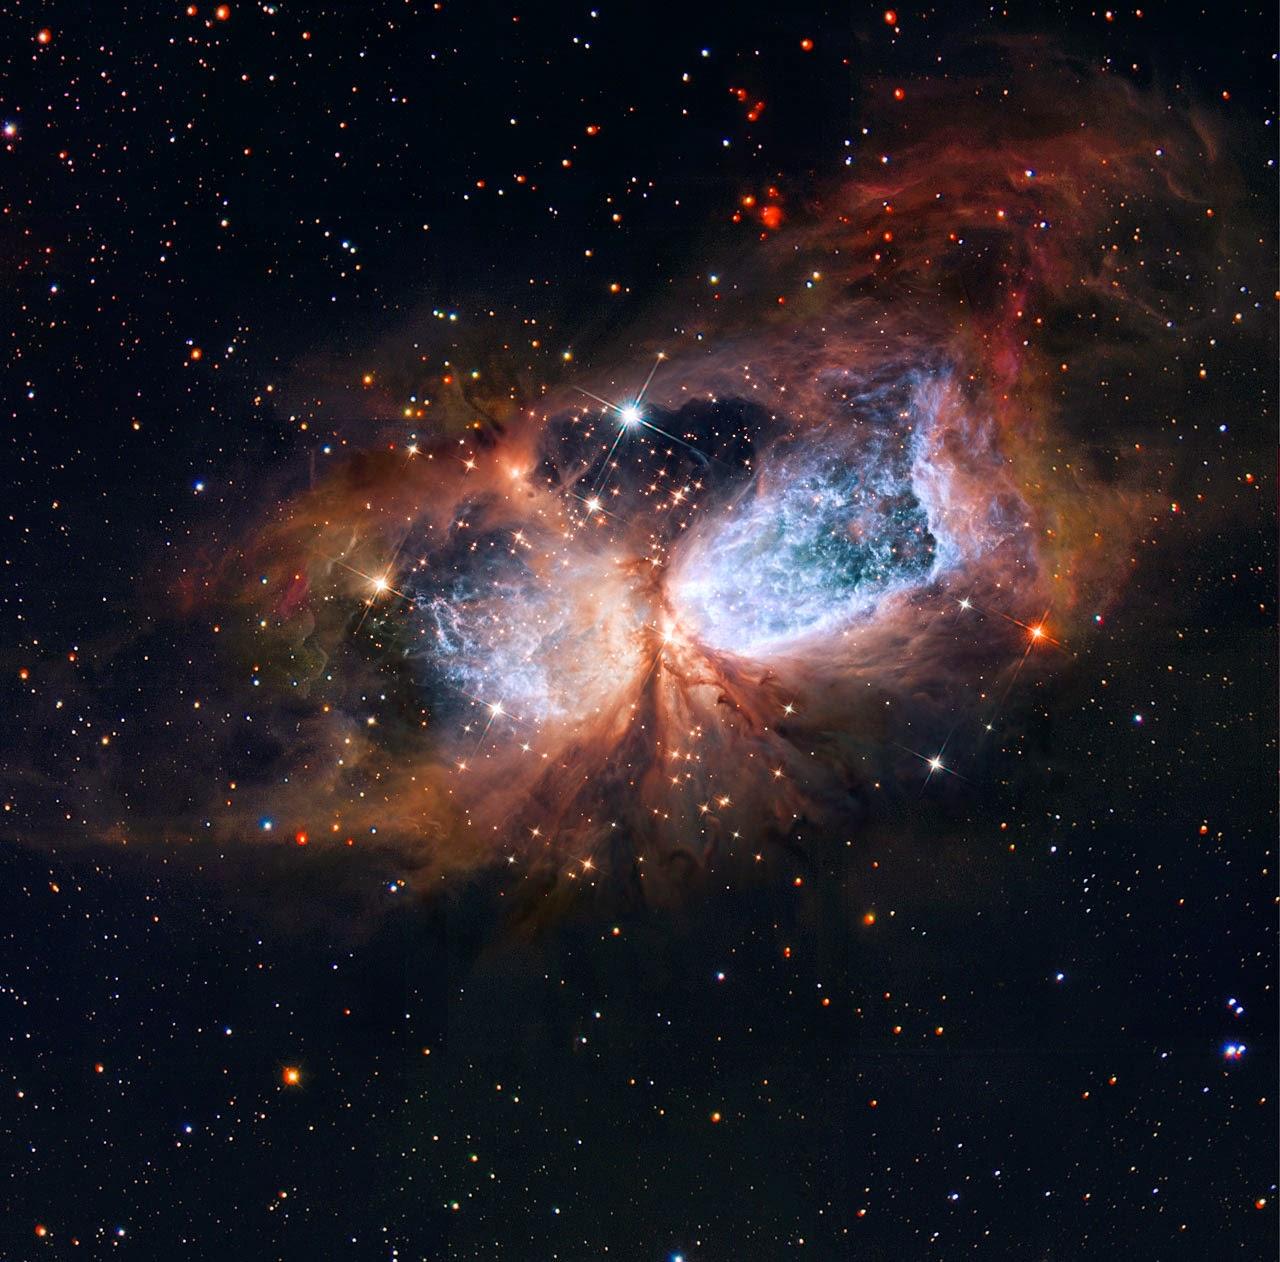 stellar and galactic astronomy uga - HD1280×1262